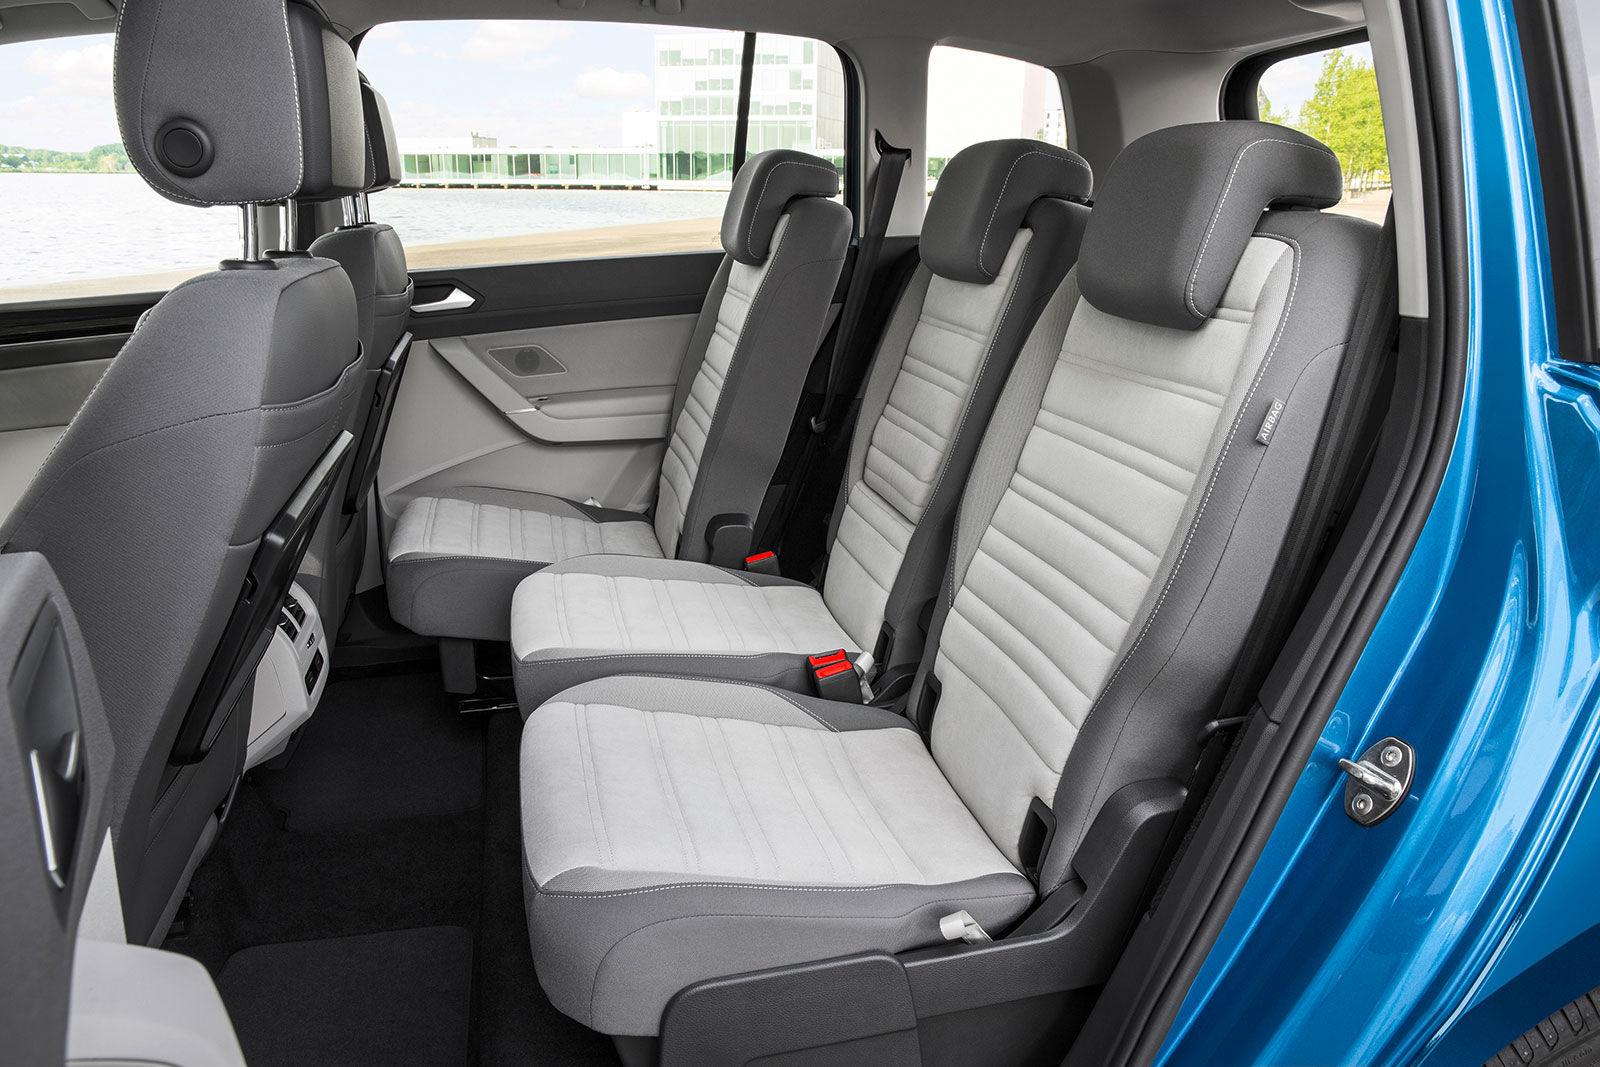 volkswagen touran review carwow. Black Bedroom Furniture Sets. Home Design Ideas